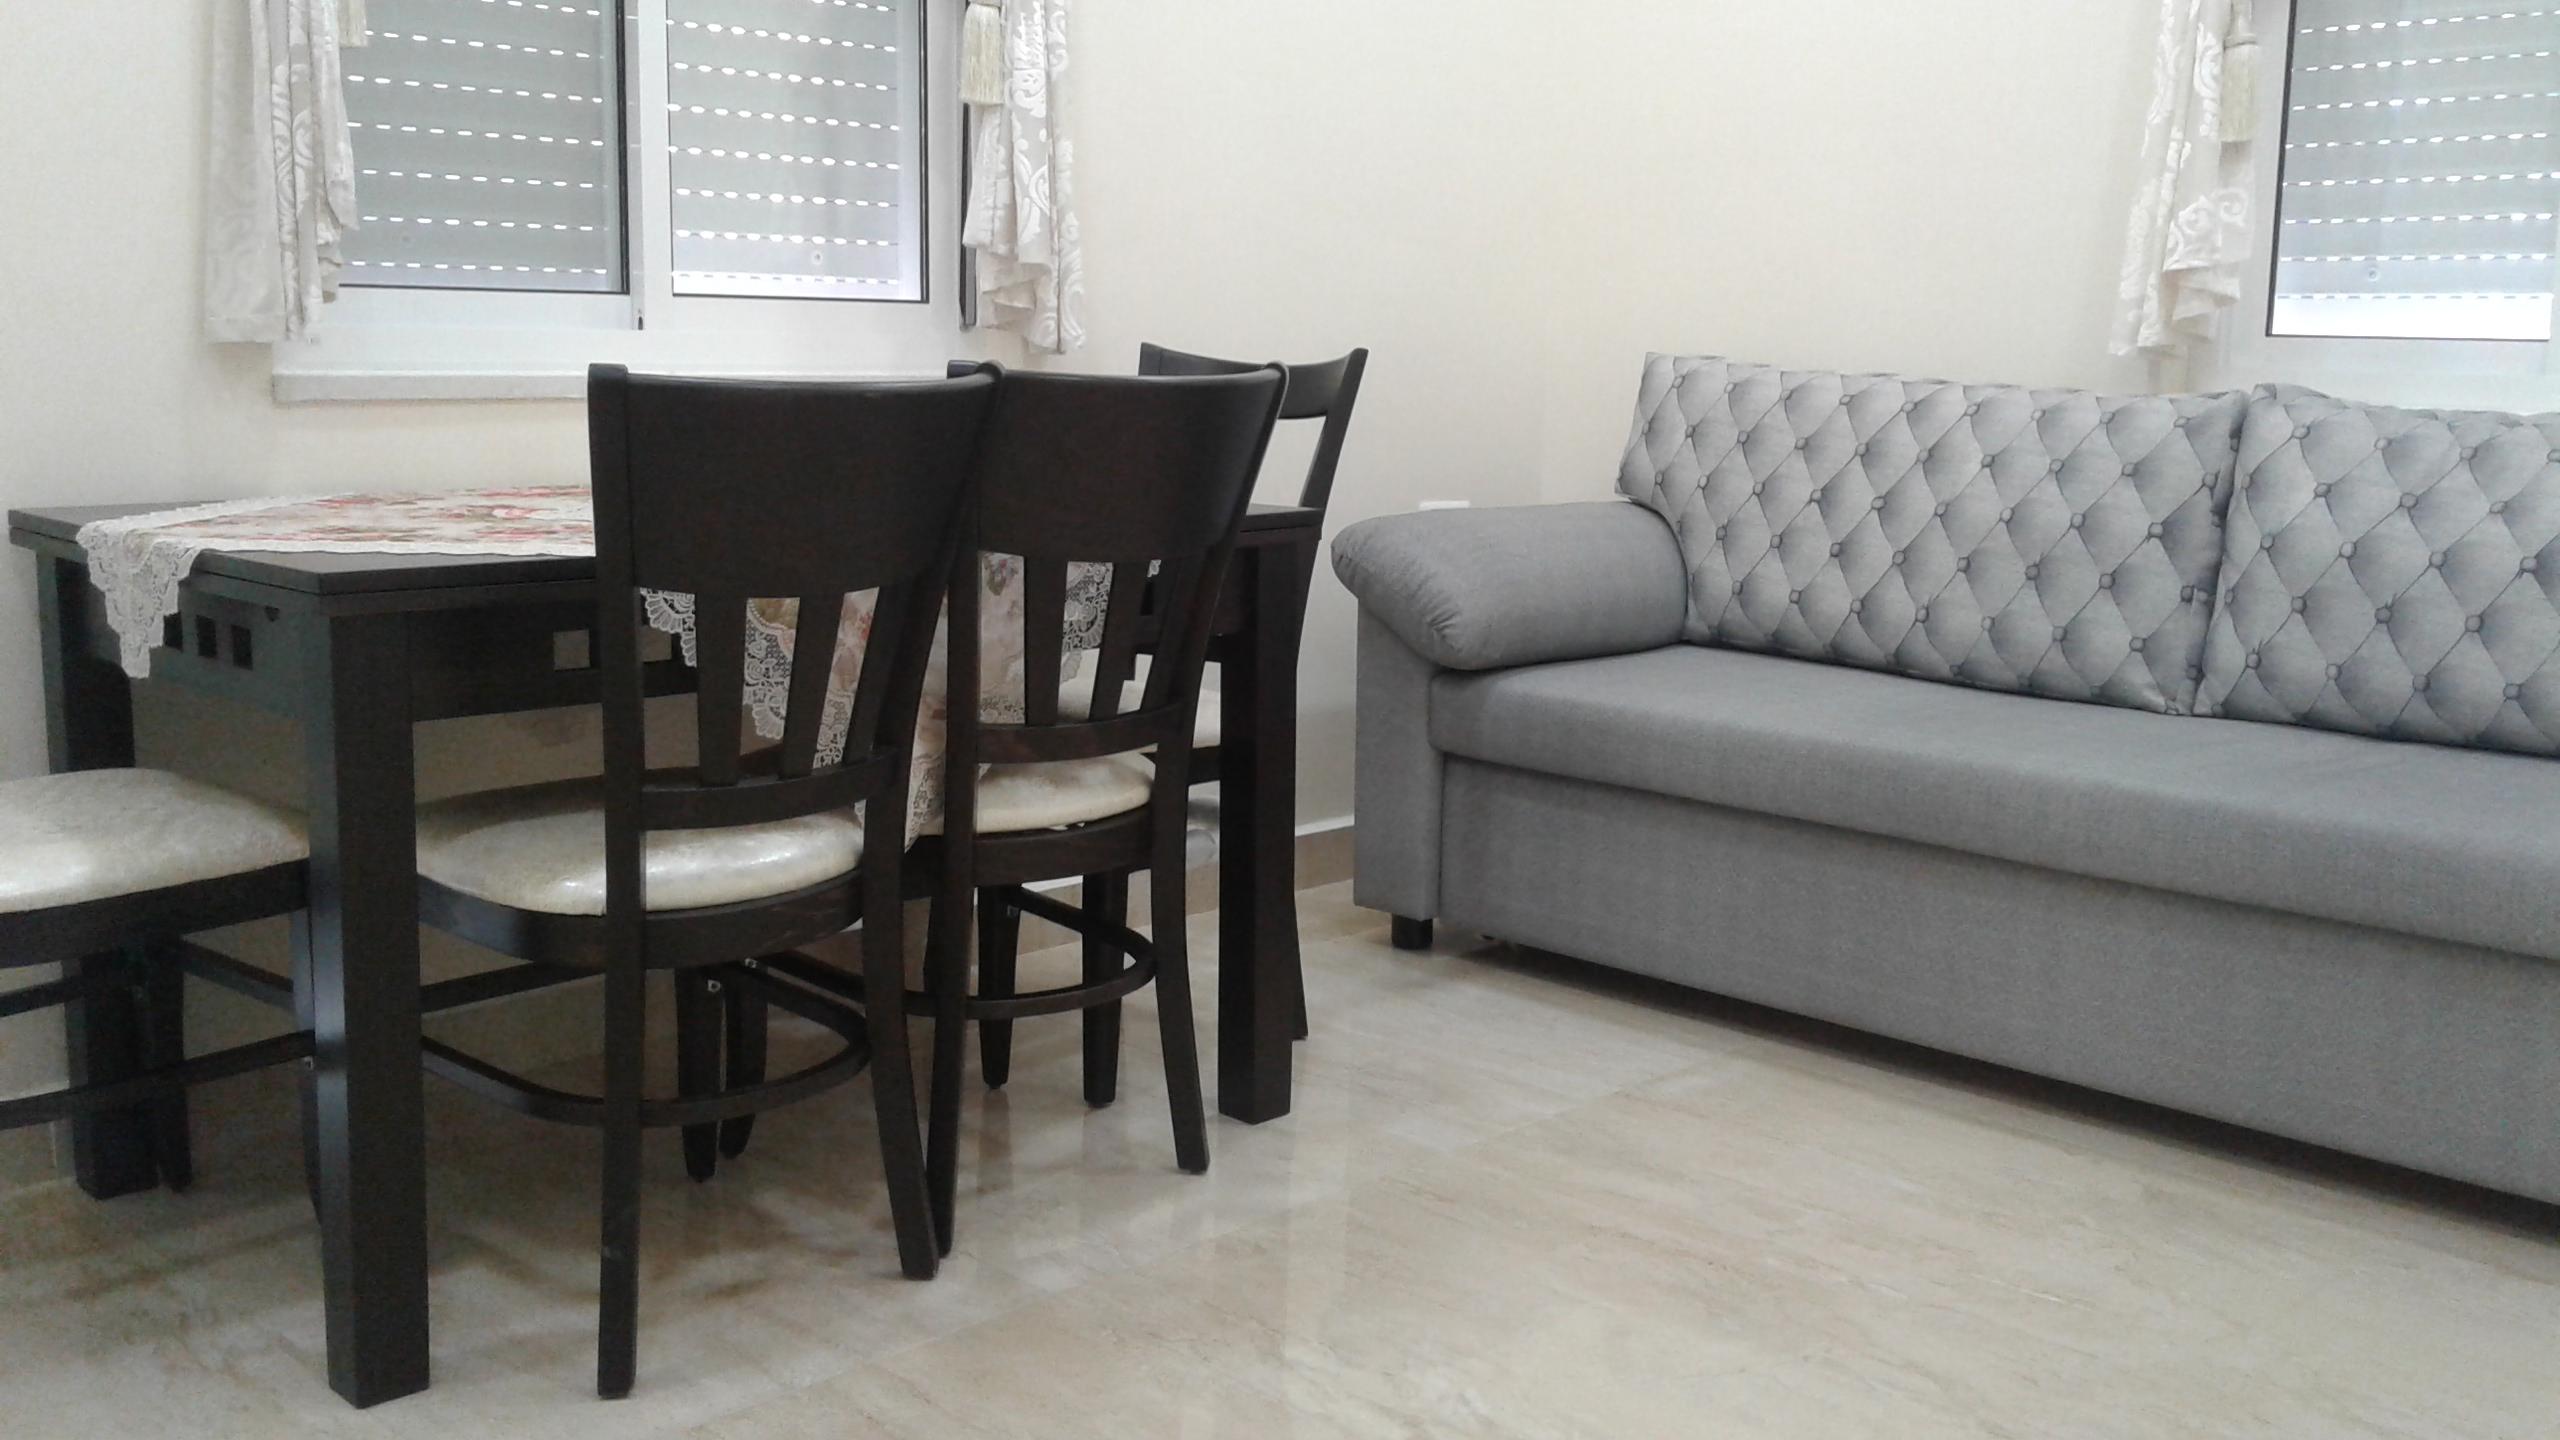 1 Bedroom Apartment in Don Yosef Hanasi, Geula